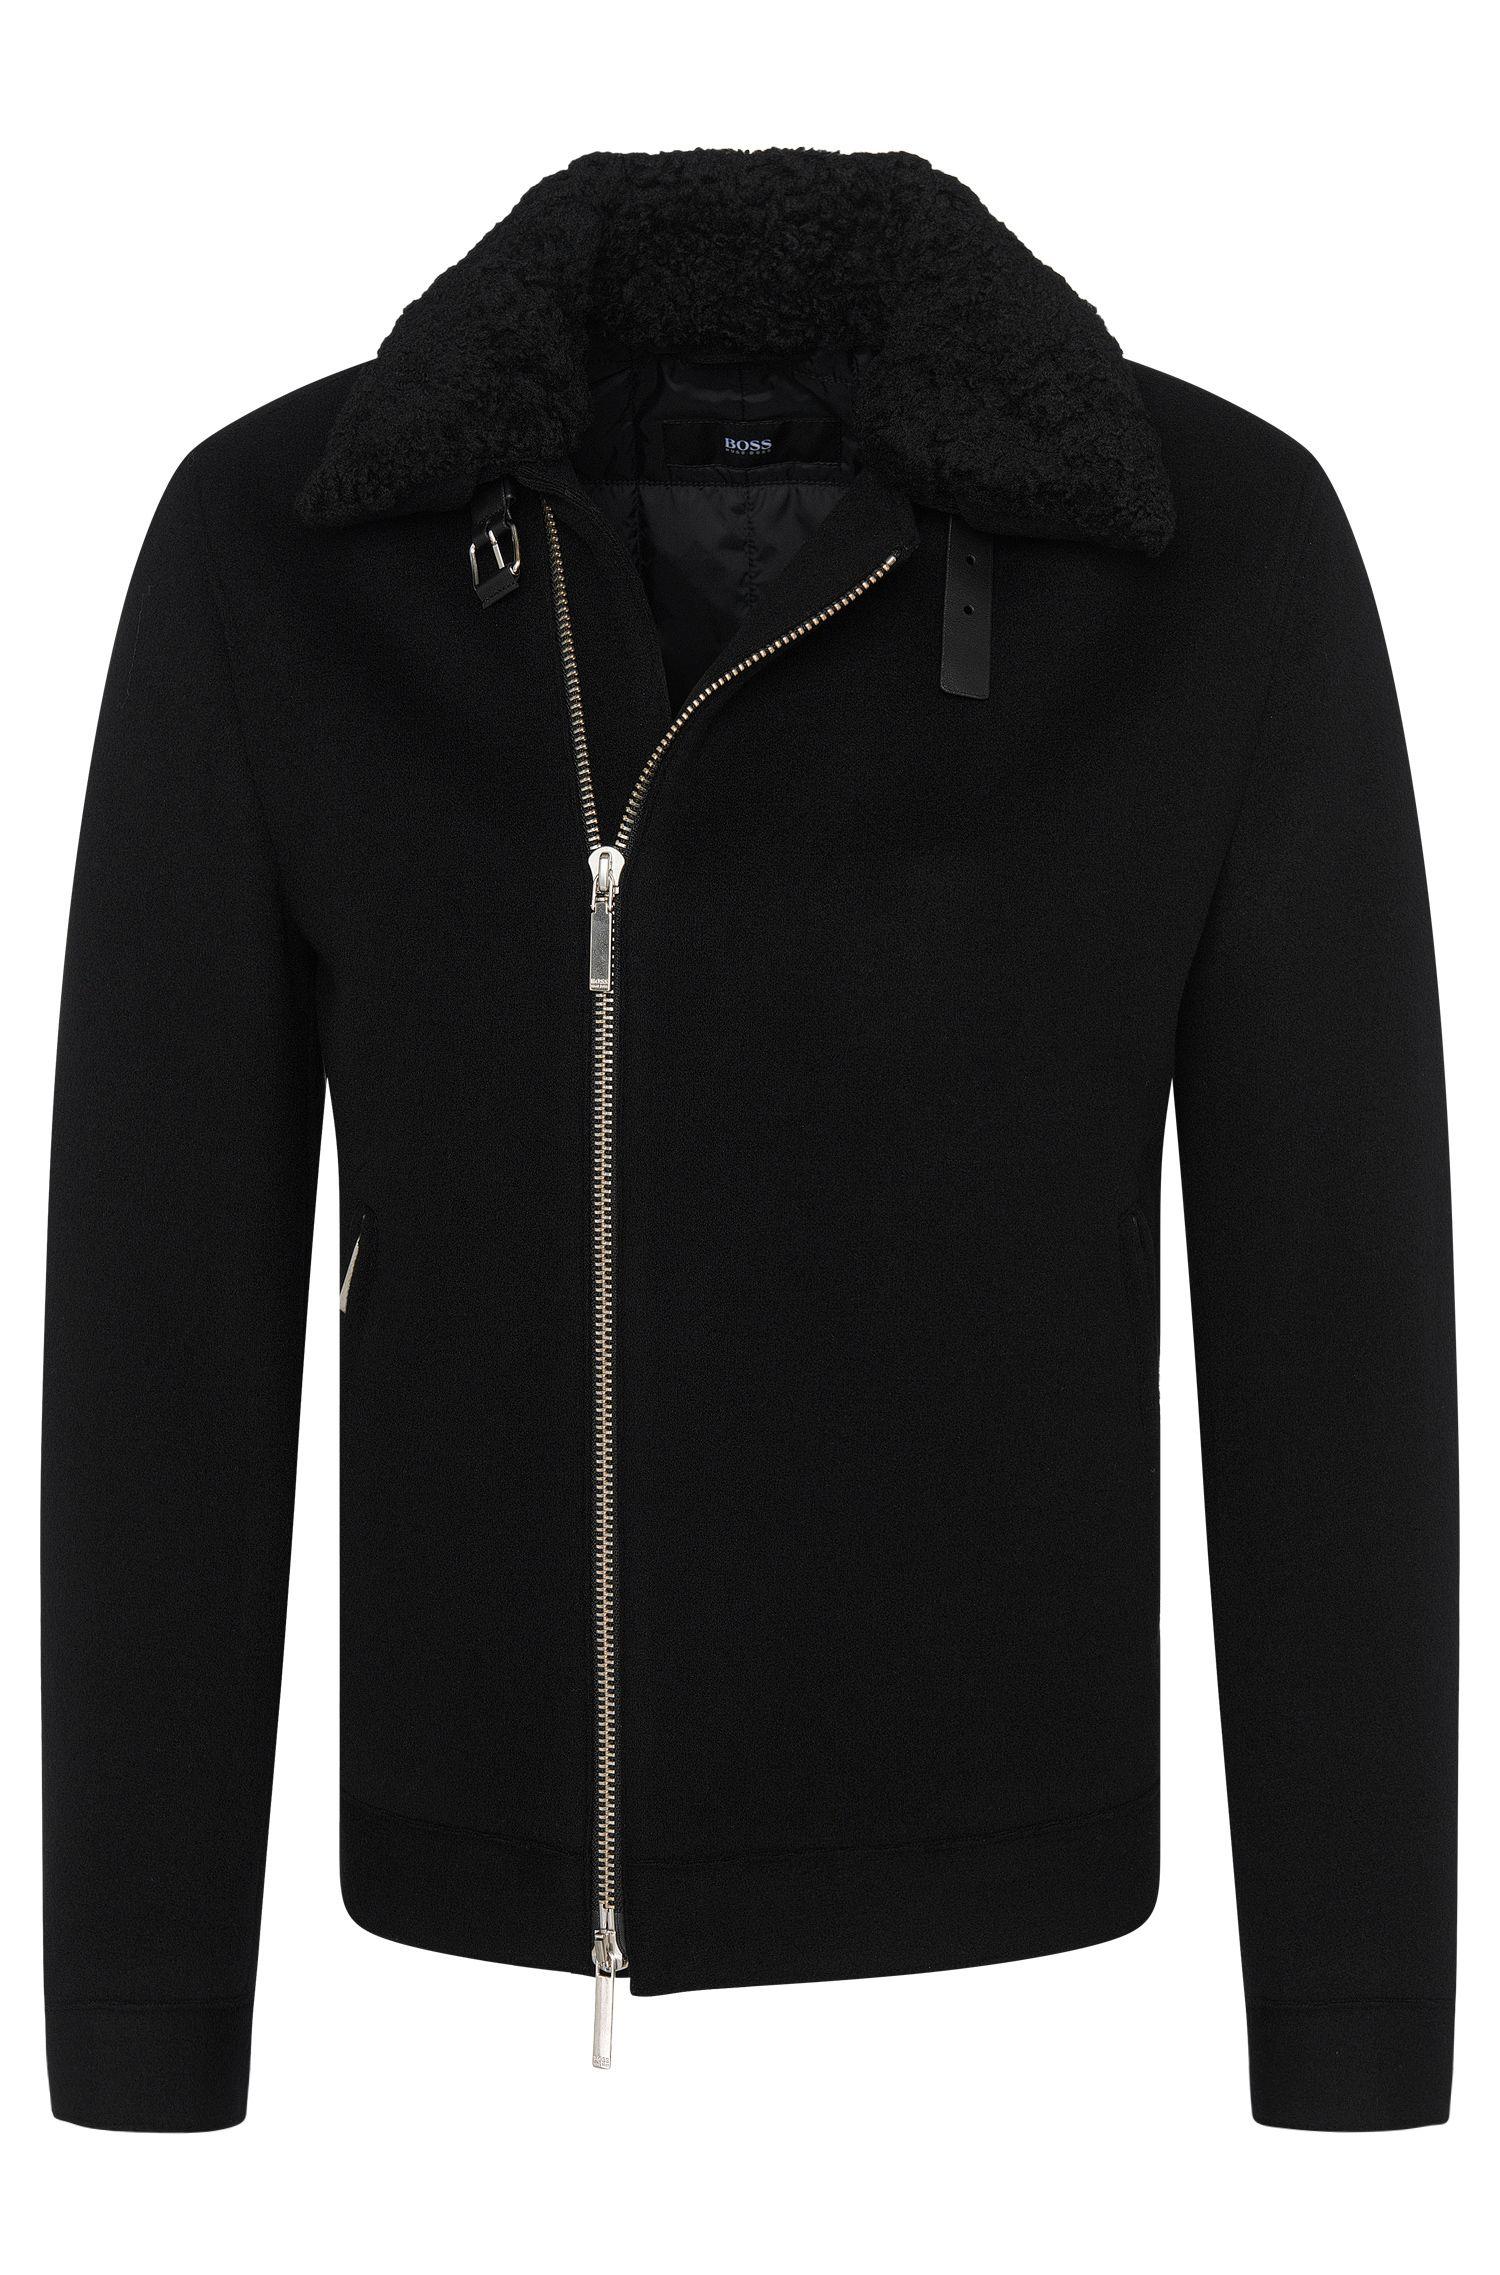 'Calsen' | Wool Blend Raw-Cut Jacket, Removable Shearling Collar